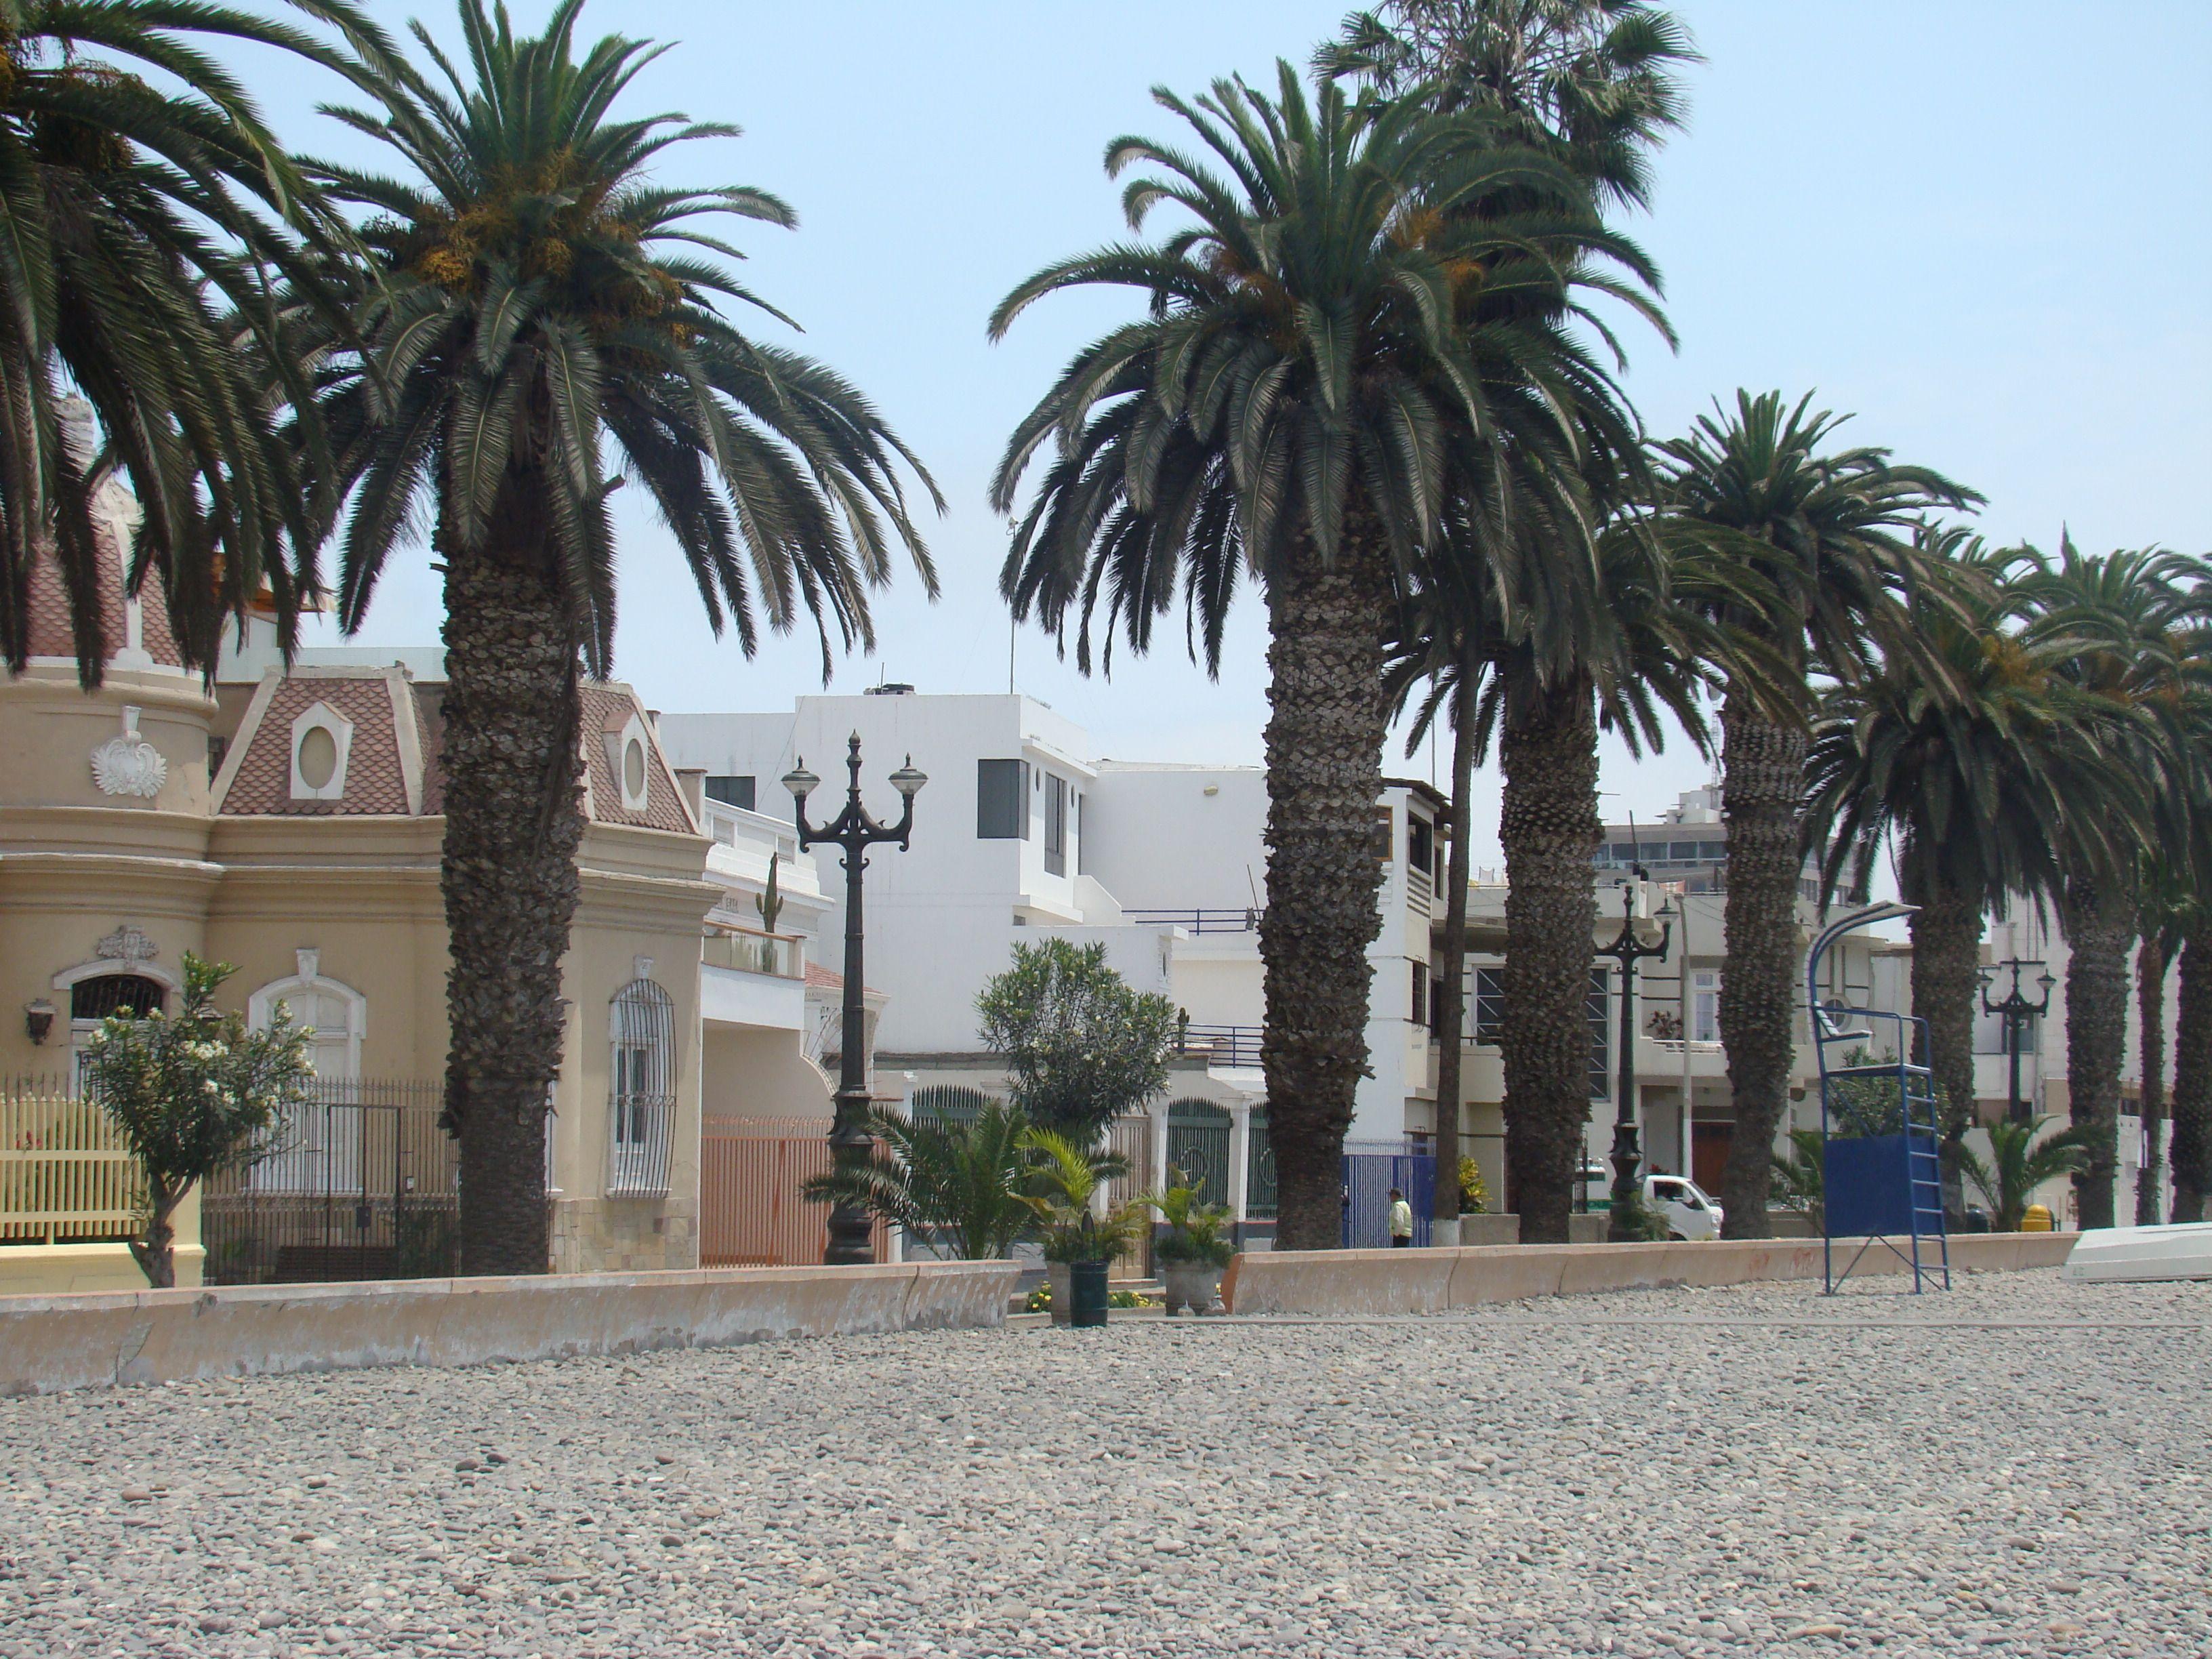 La Punta El Callao Per Special Scenary Pinterest Peru  # Muebles Para Cevicheria